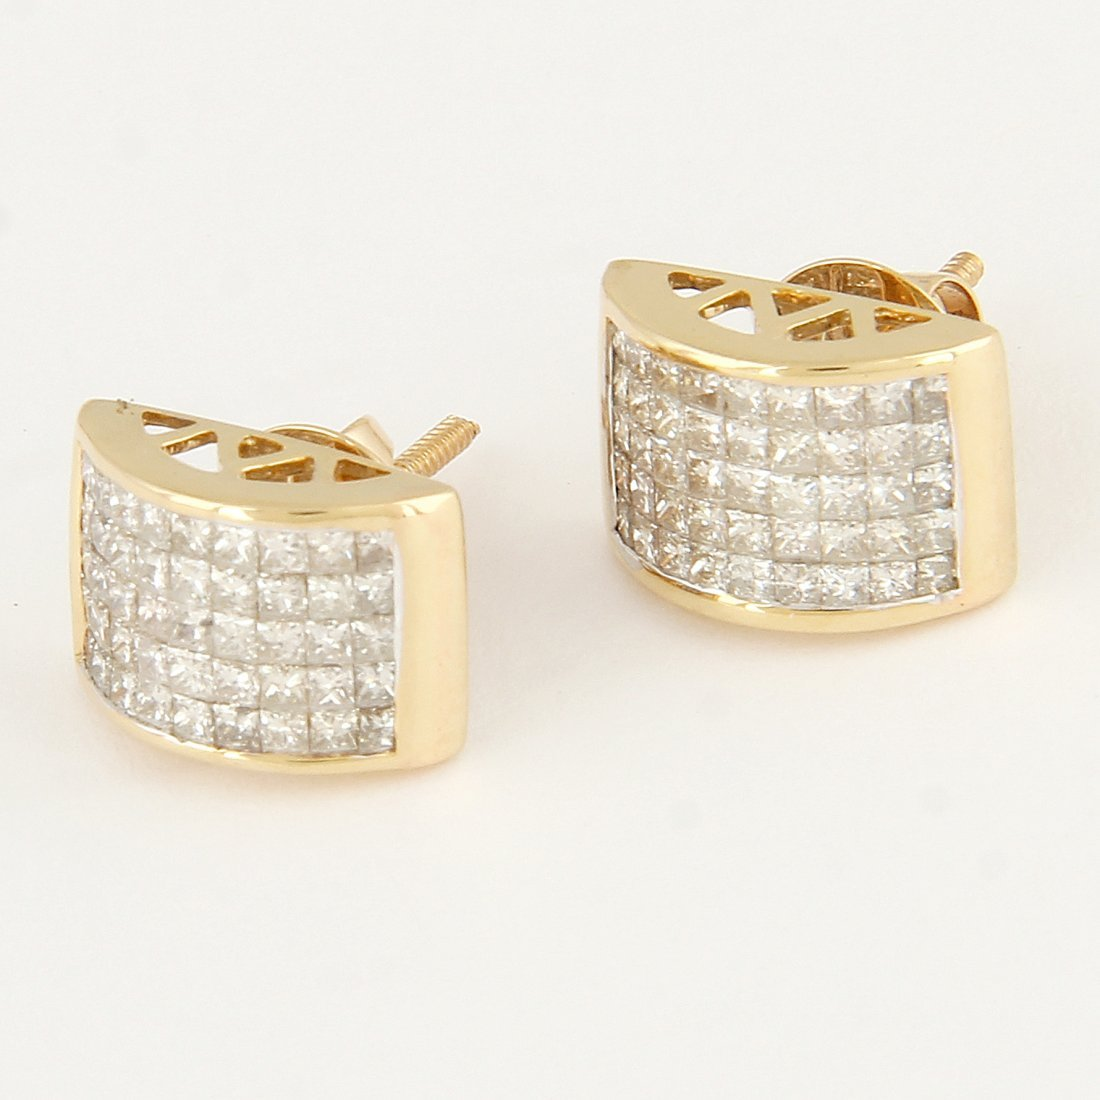 14 K / 585 Yellow Gold Diamond Earring Studs